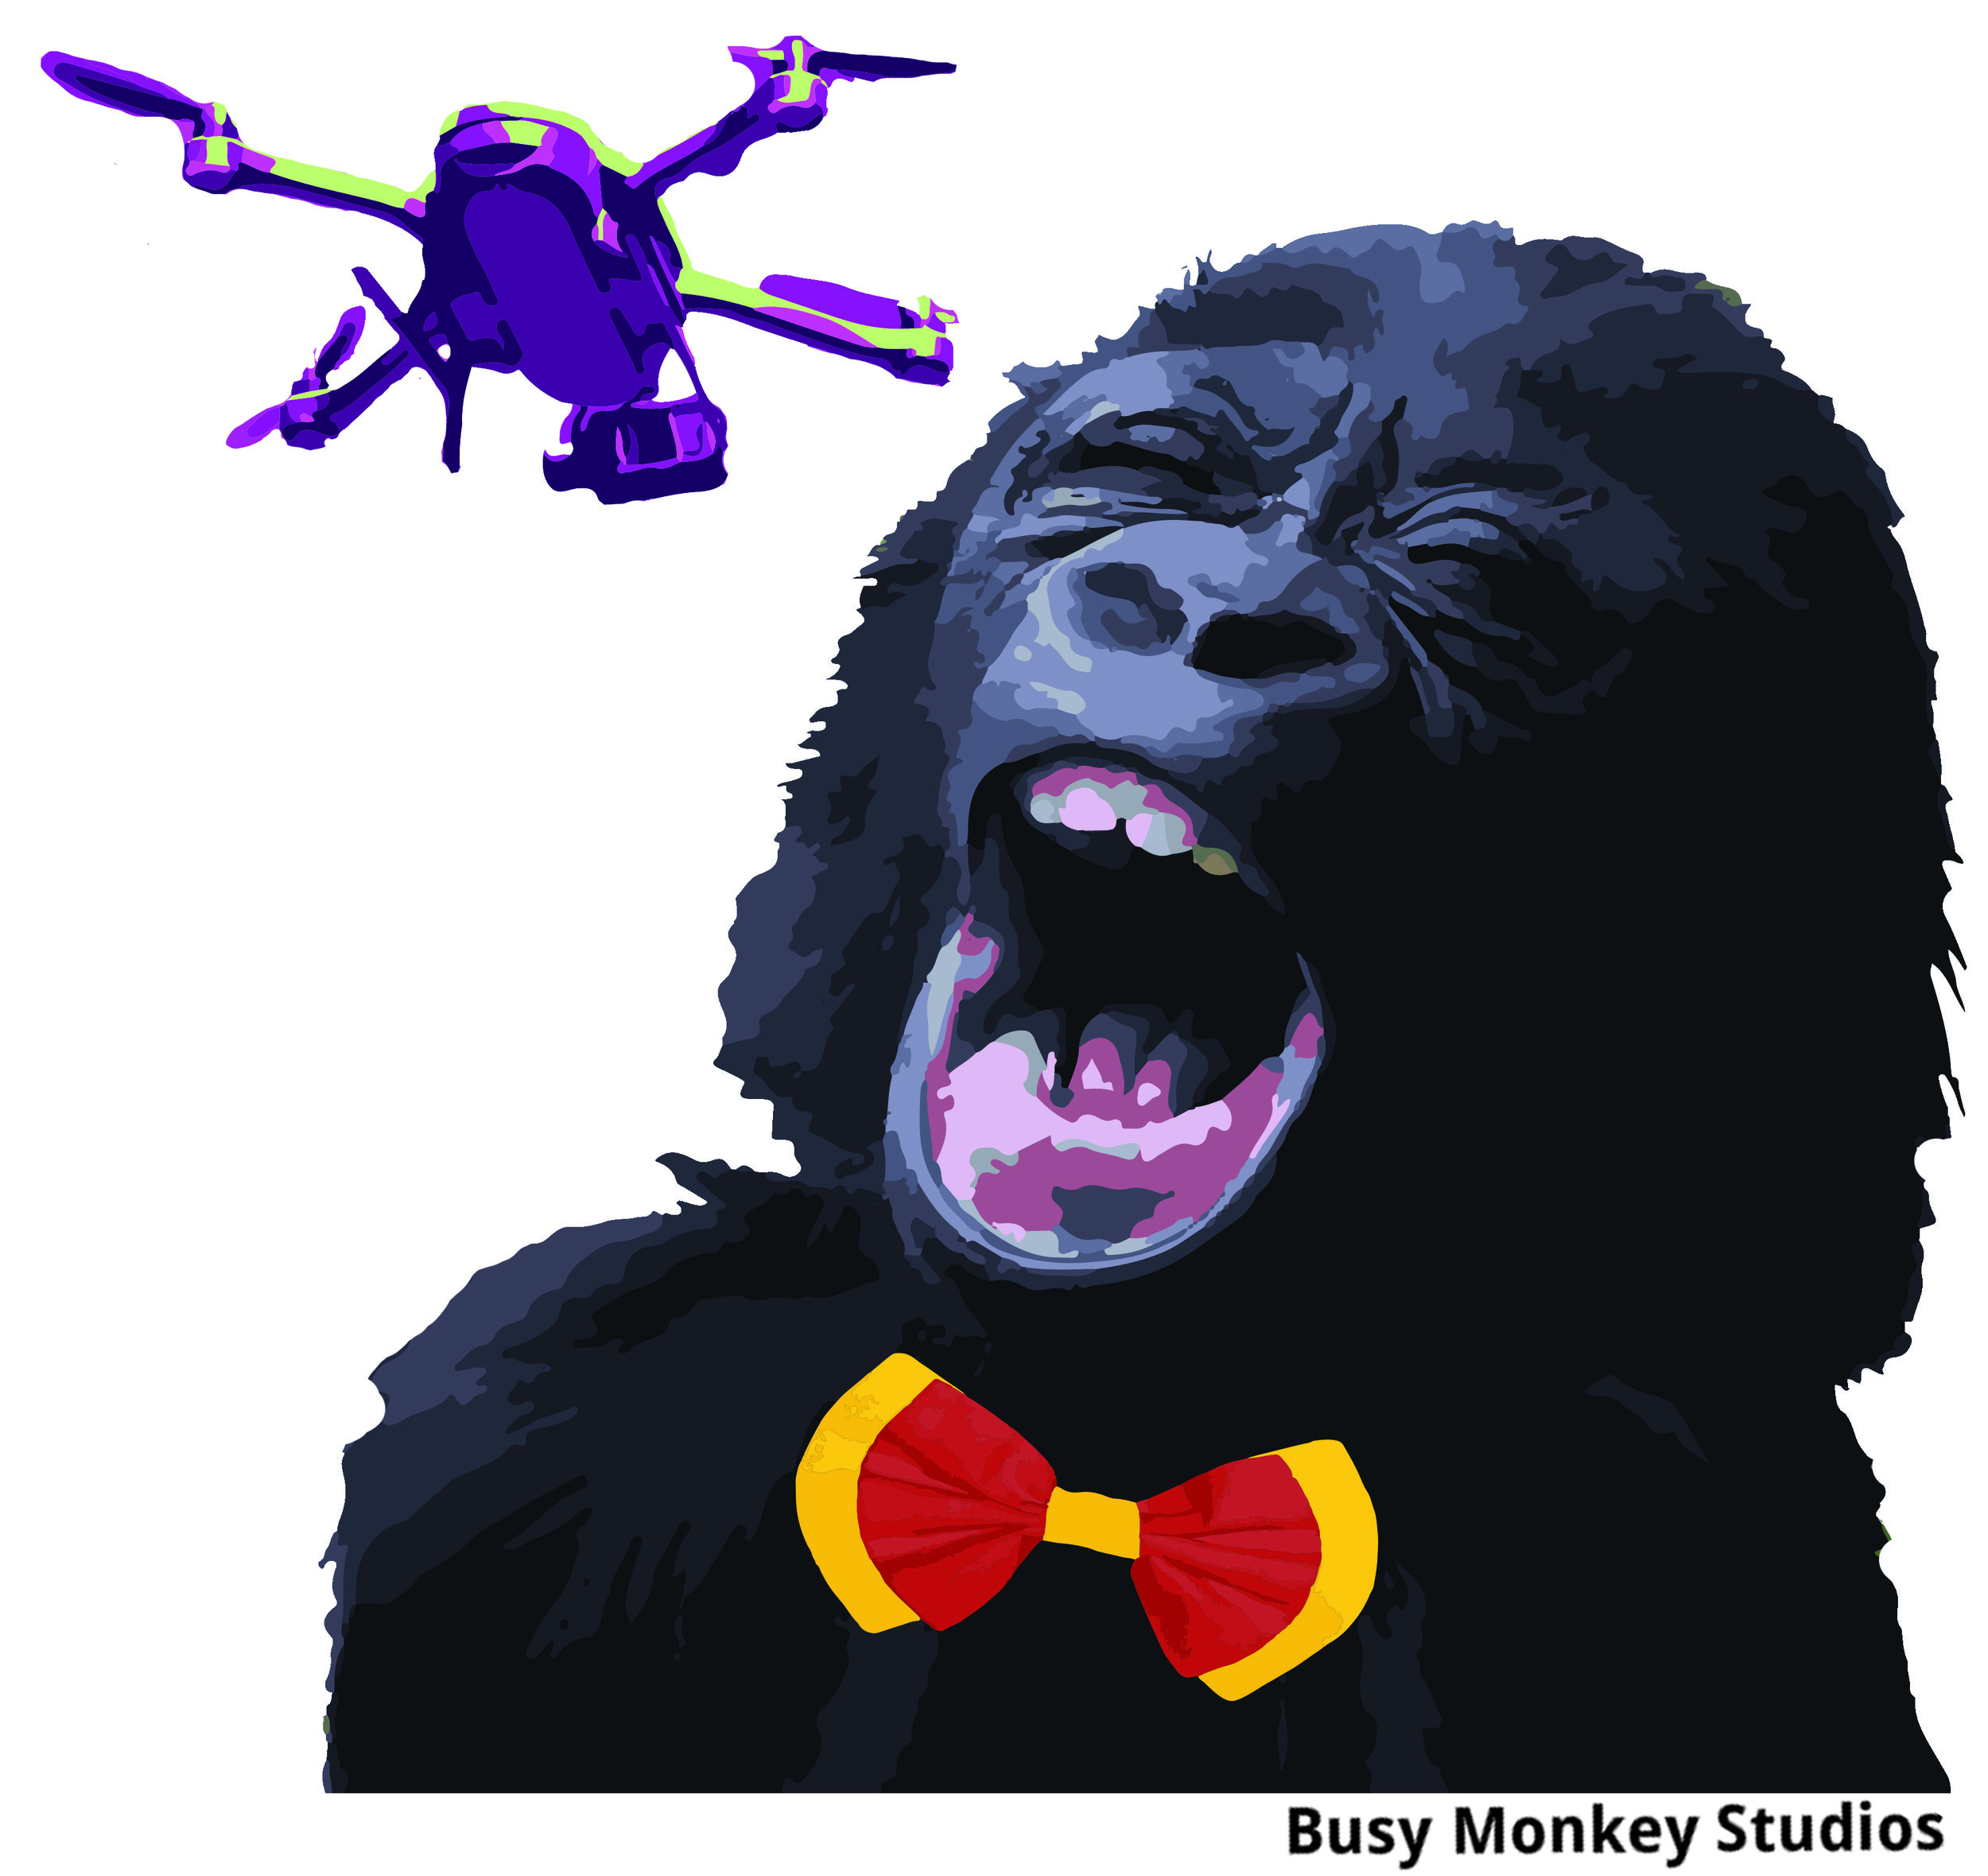 2016-Laura-Coats-Gorilla-Drone.jpg